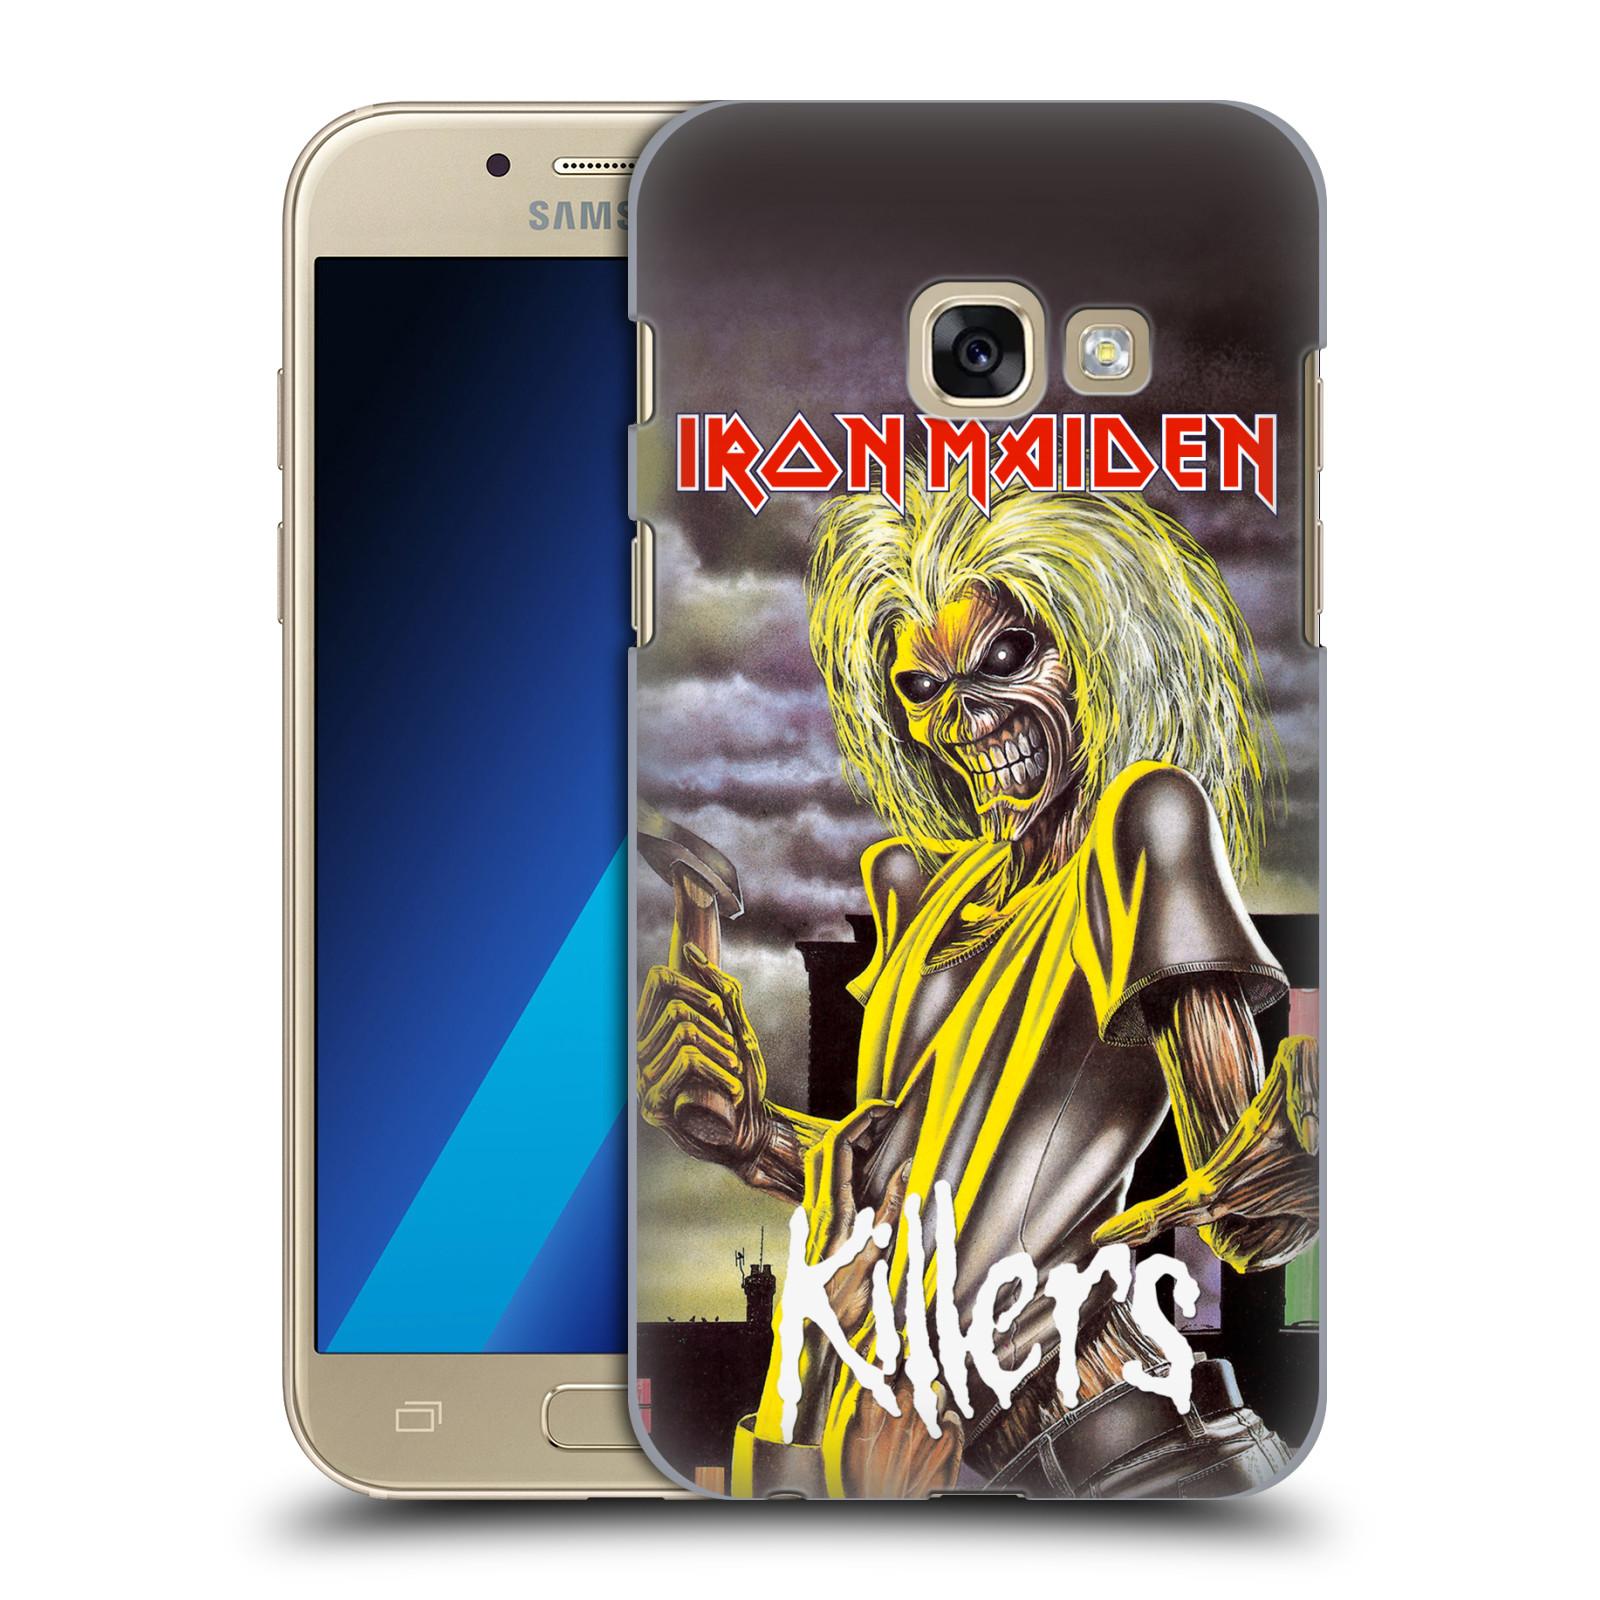 Plastové pouzdro na mobil Samsung Galaxy A3 (2017) HEAD CASE - Iron Maiden - Killers